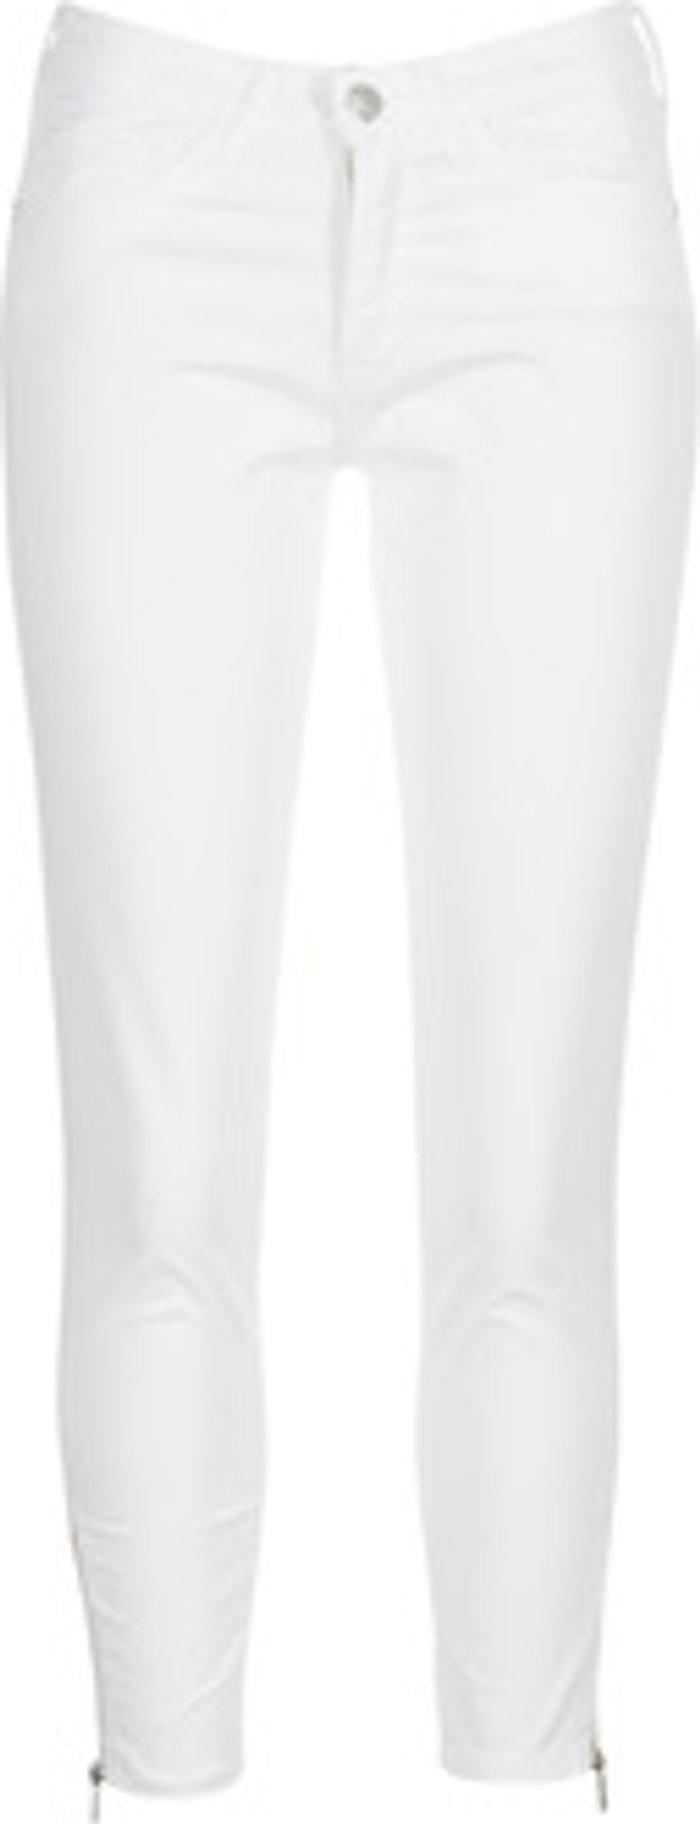 Gaudi Gaudi  PODALI  women's  in White. Sizes available:US 27,US 26